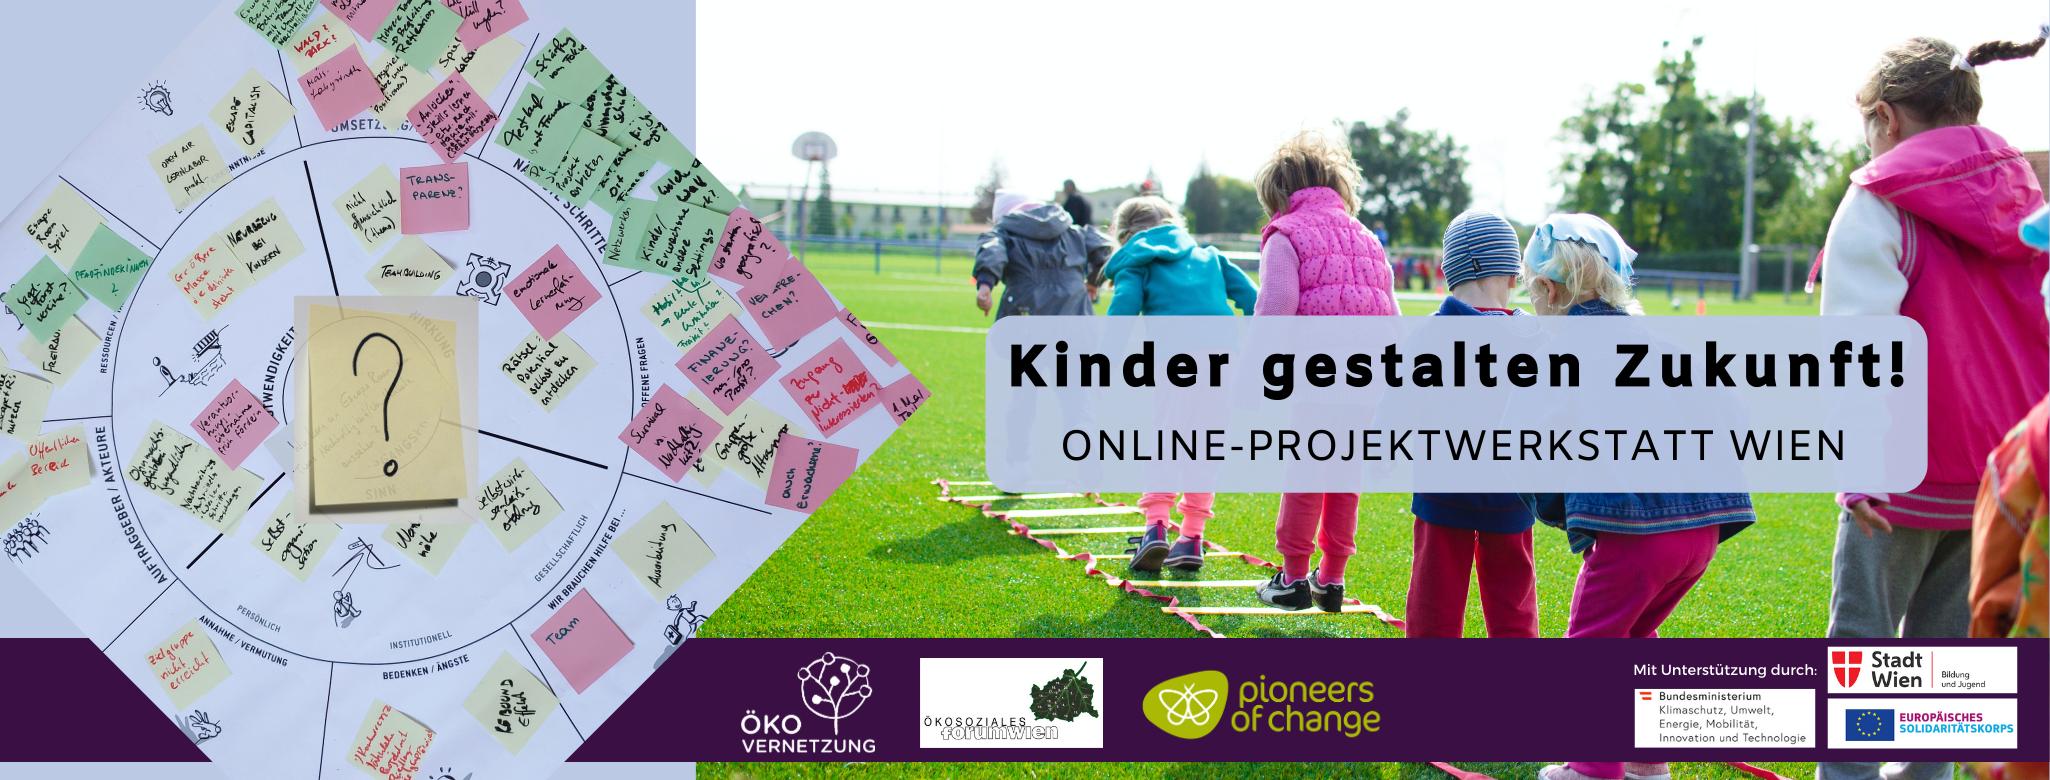 Projektwerkstatt November: Kinder gestalten Zukunft!